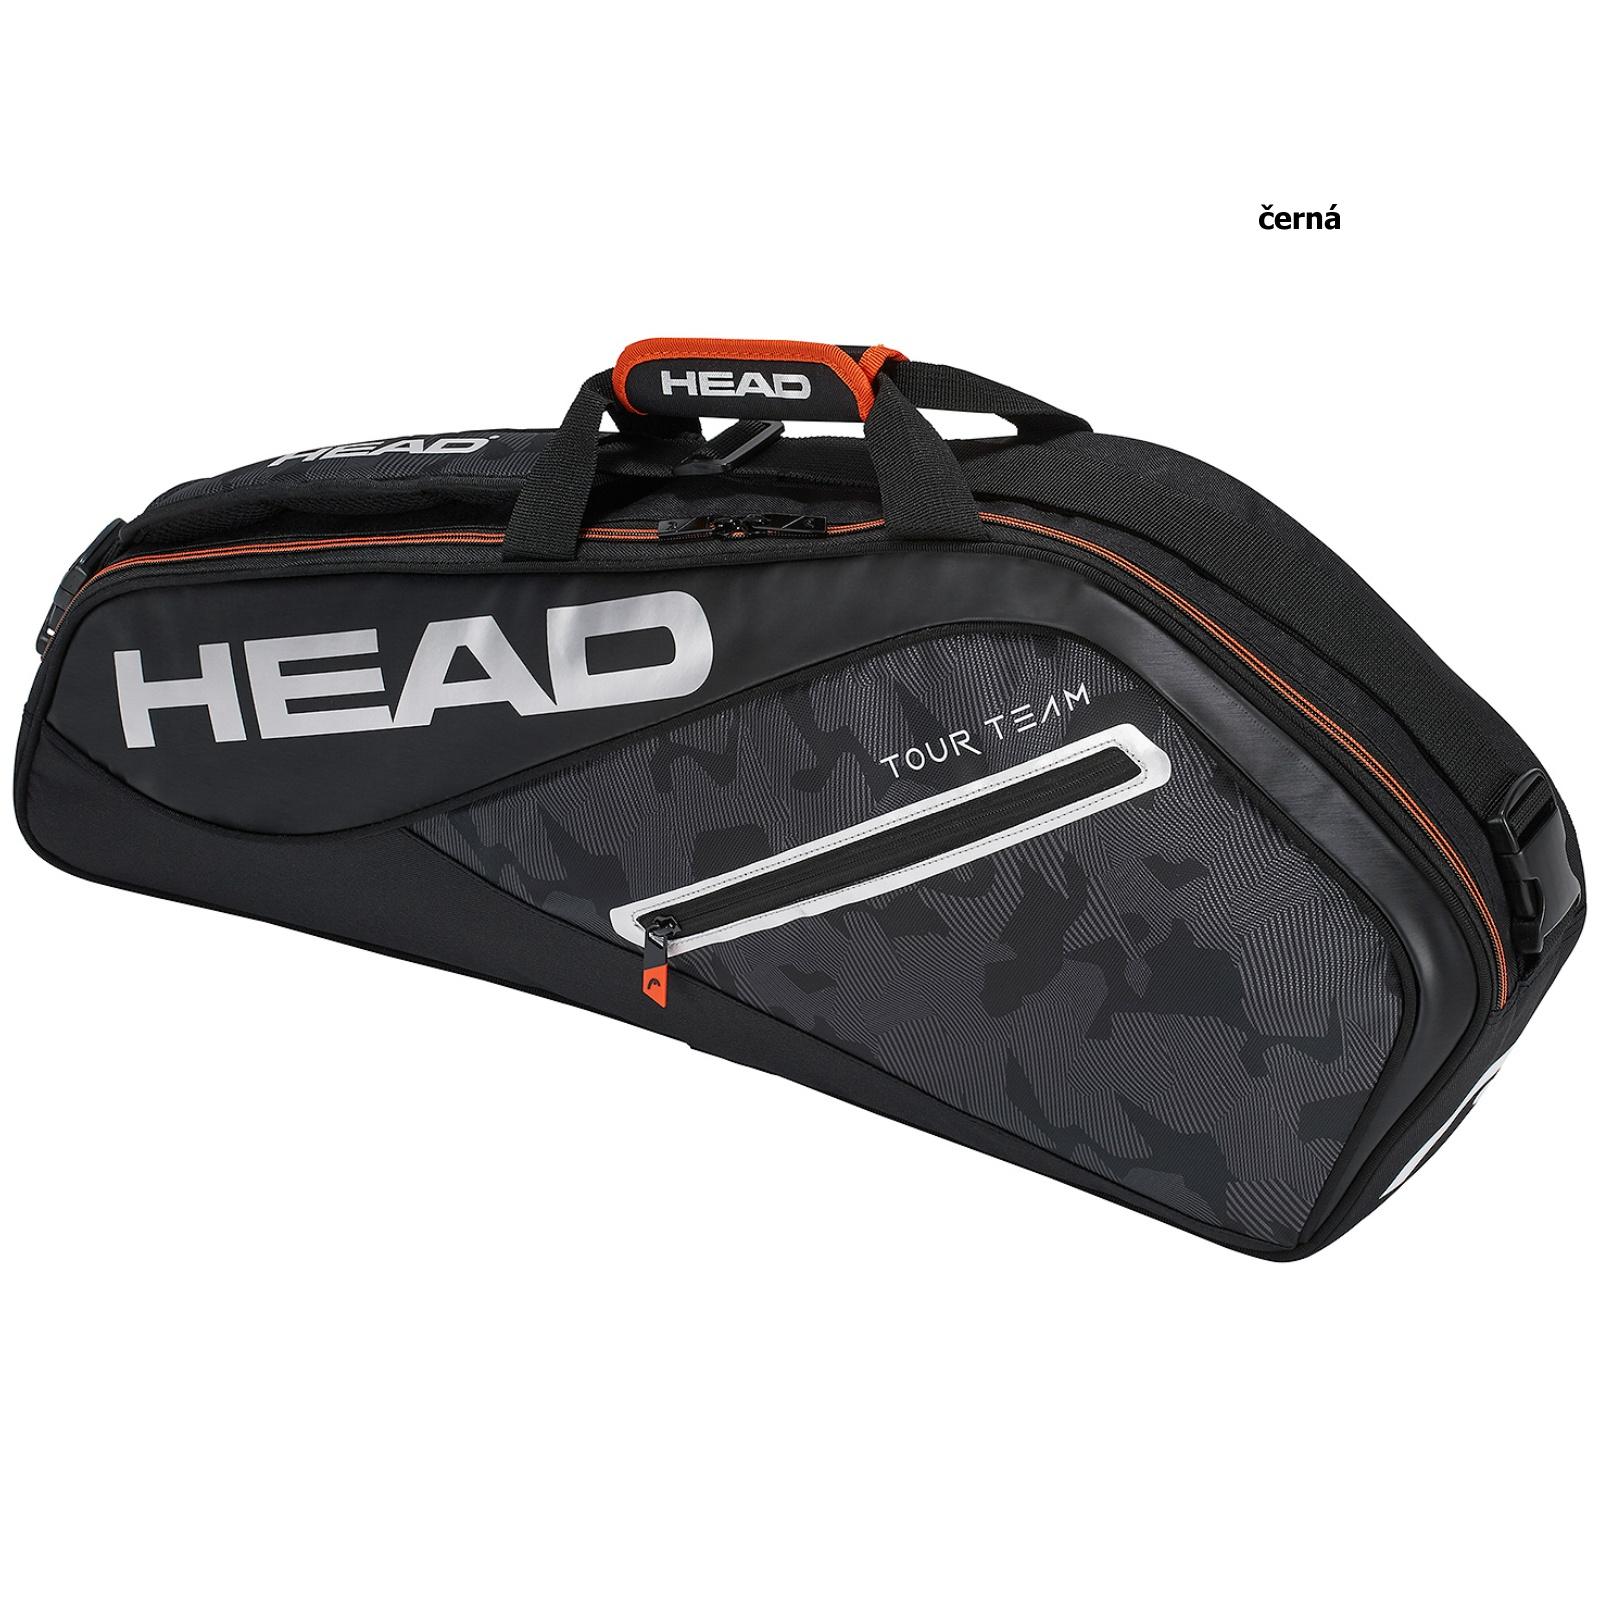 c2b50e8106 Tenisová taška HEAD Tour 3R Pro - čierna